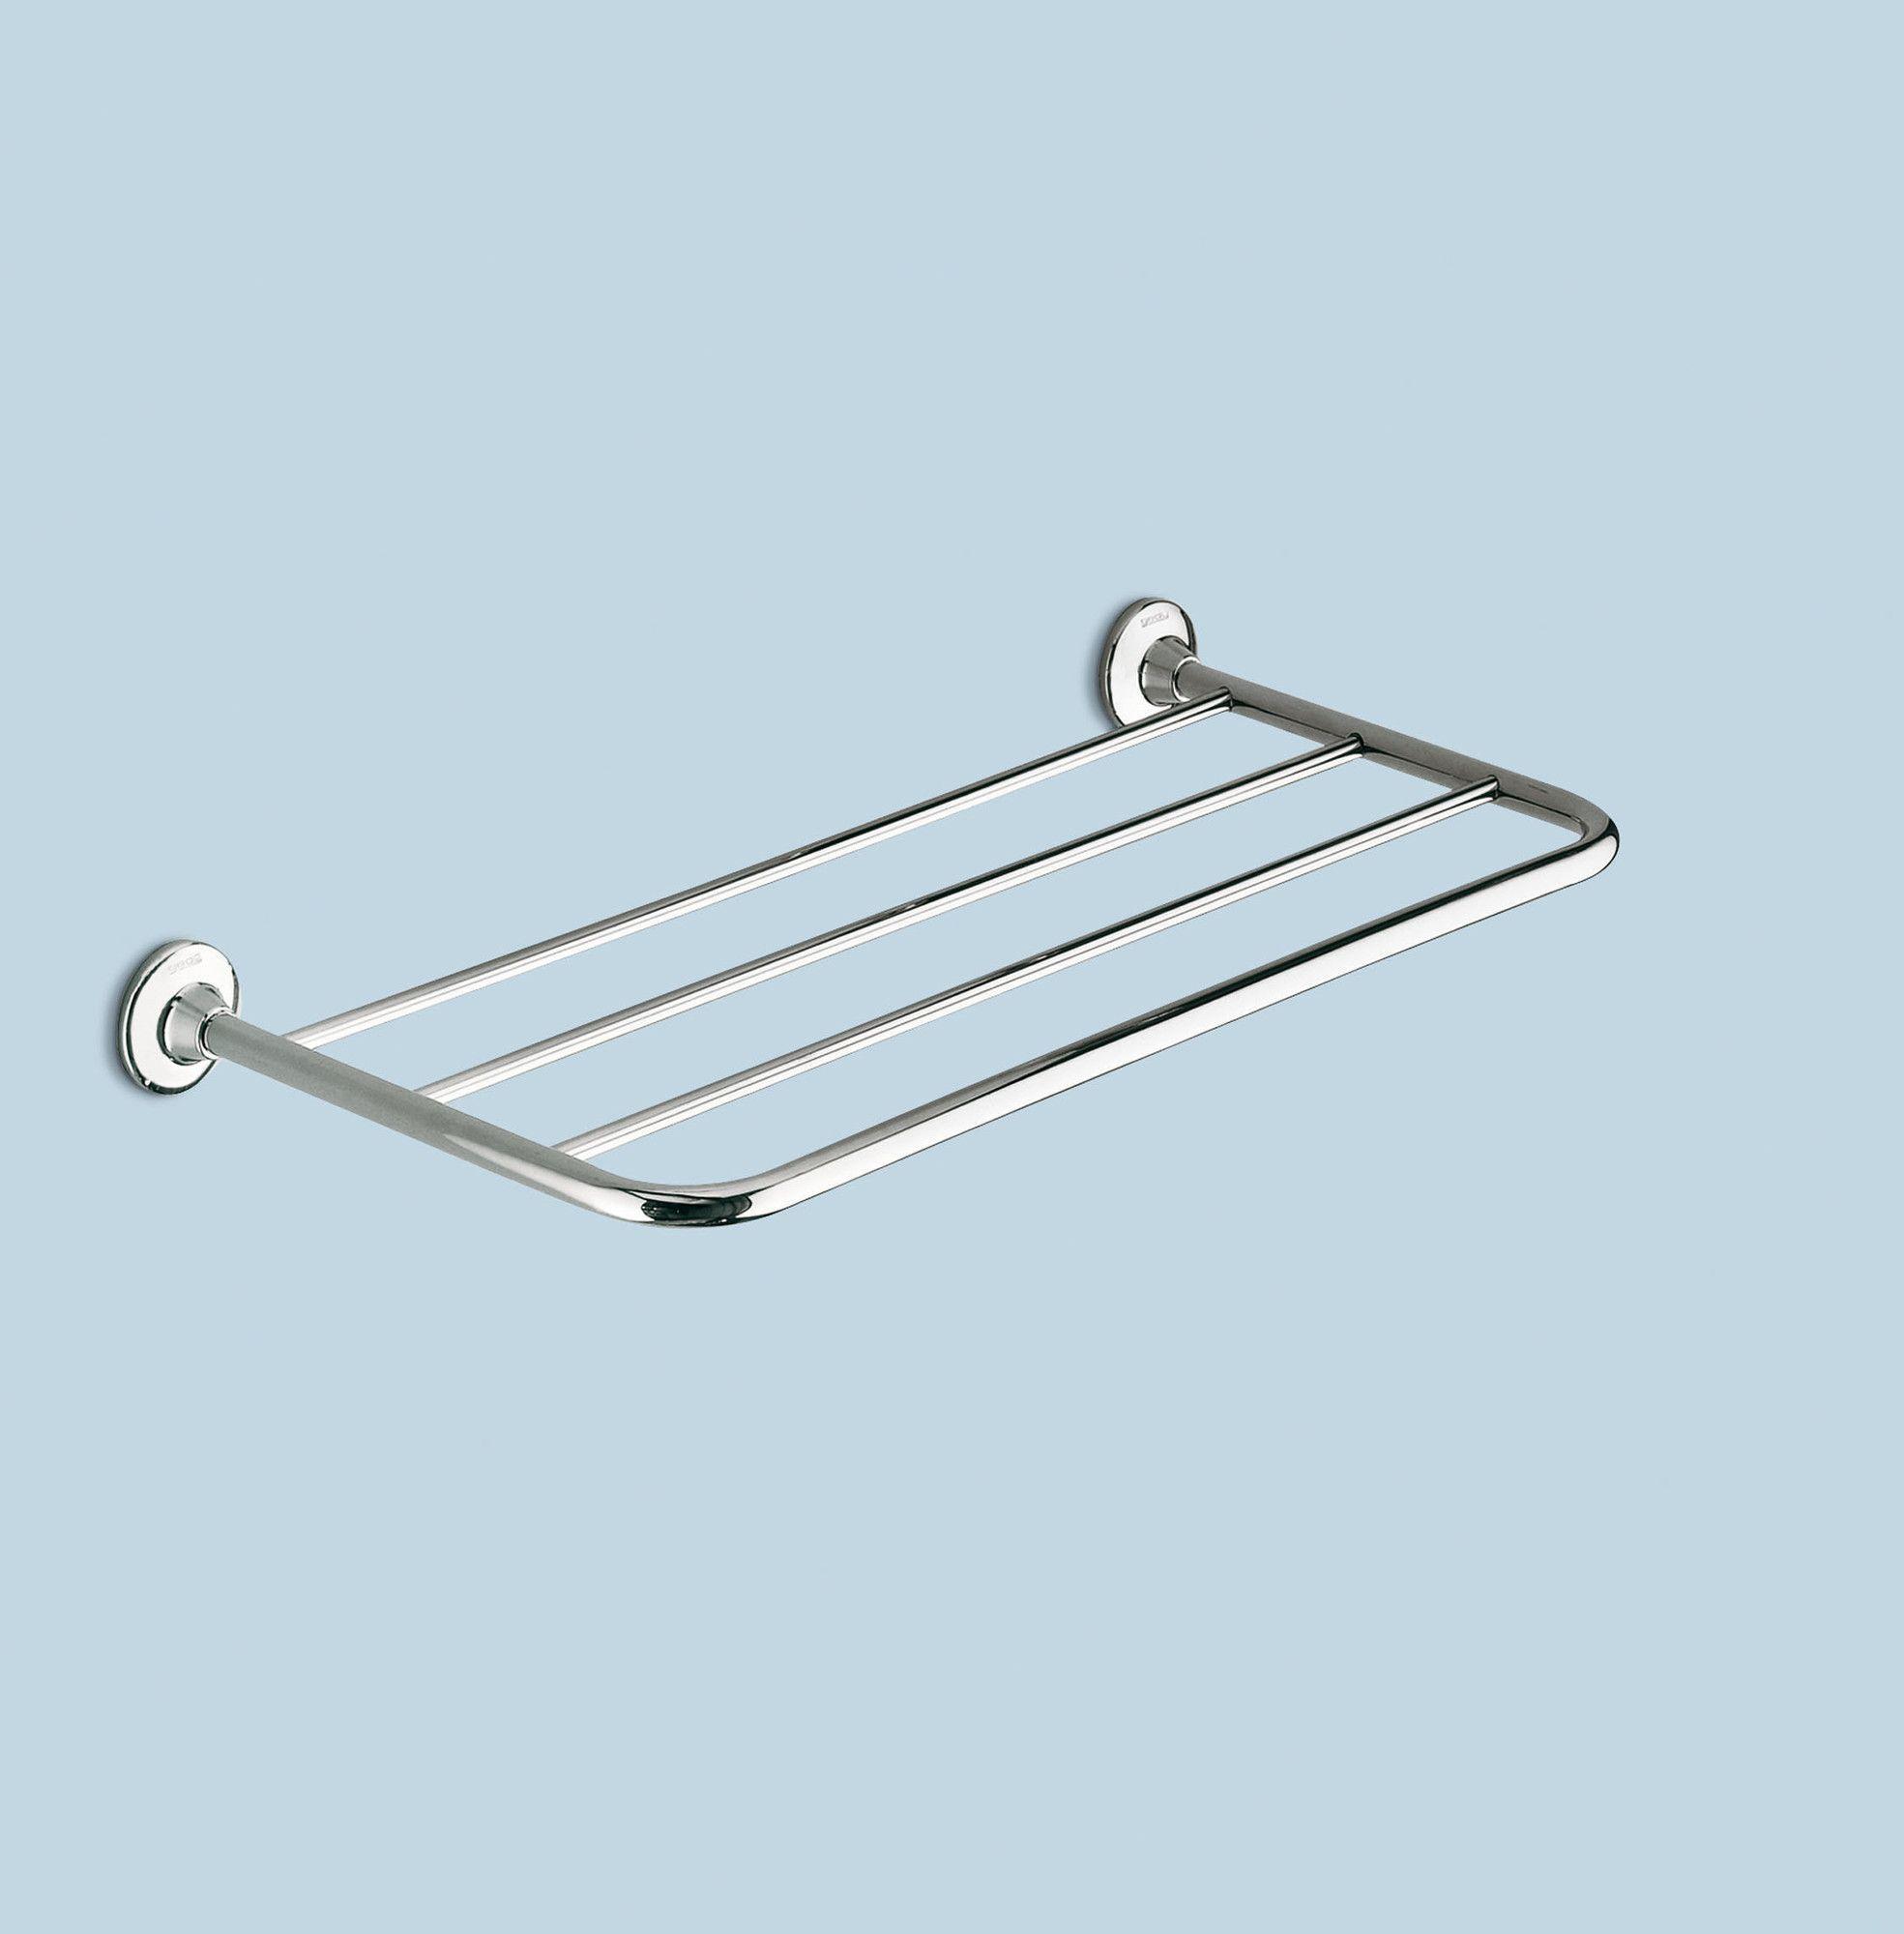 Ascot Wall Shelf | Products | Pinterest | Towel shelf, Wall mount ...